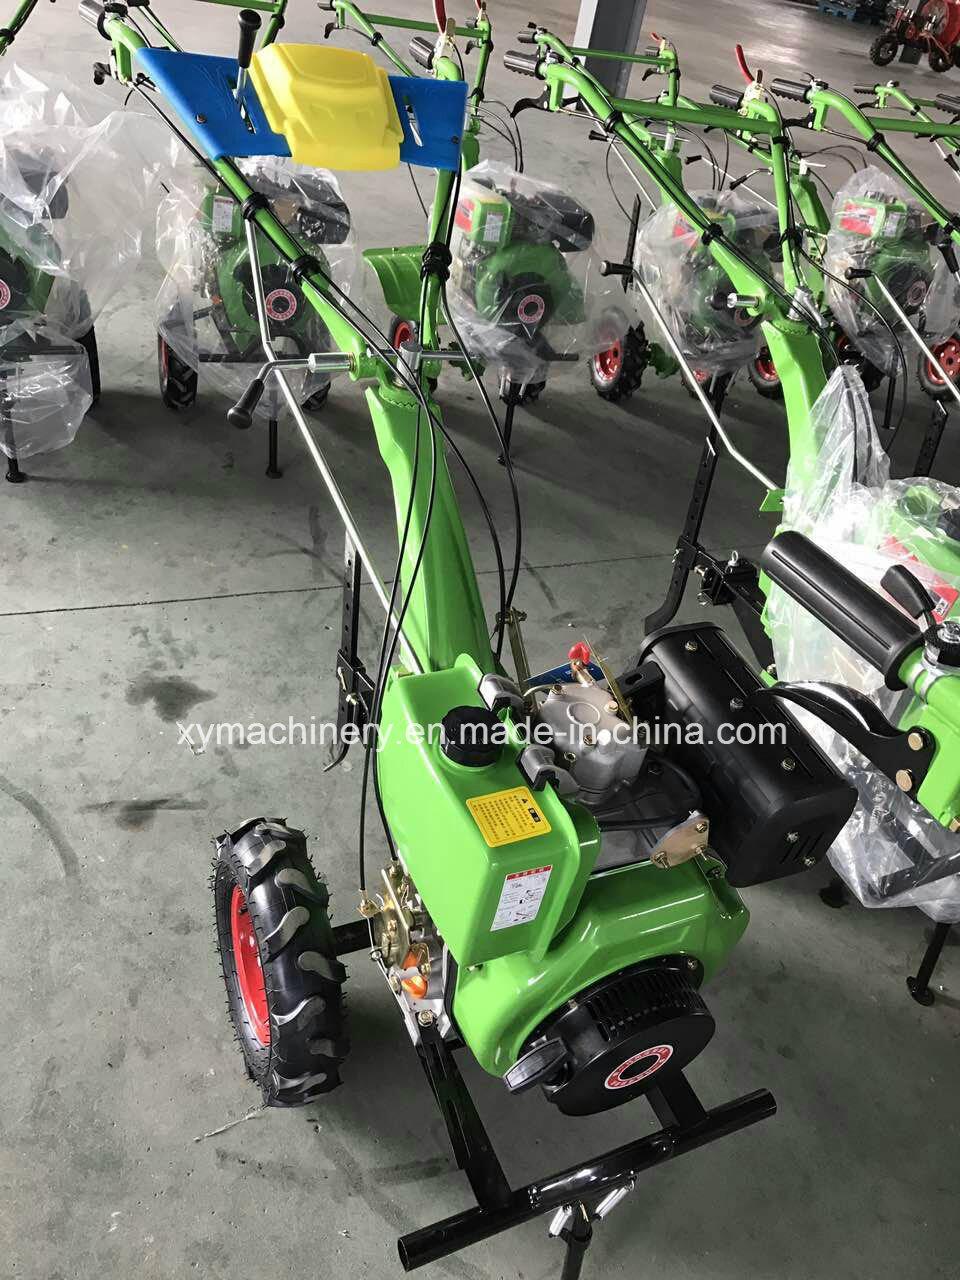 Multi-Fuction Cultivator Tiller, Rotary Cultivator, Diesel Power Tiller